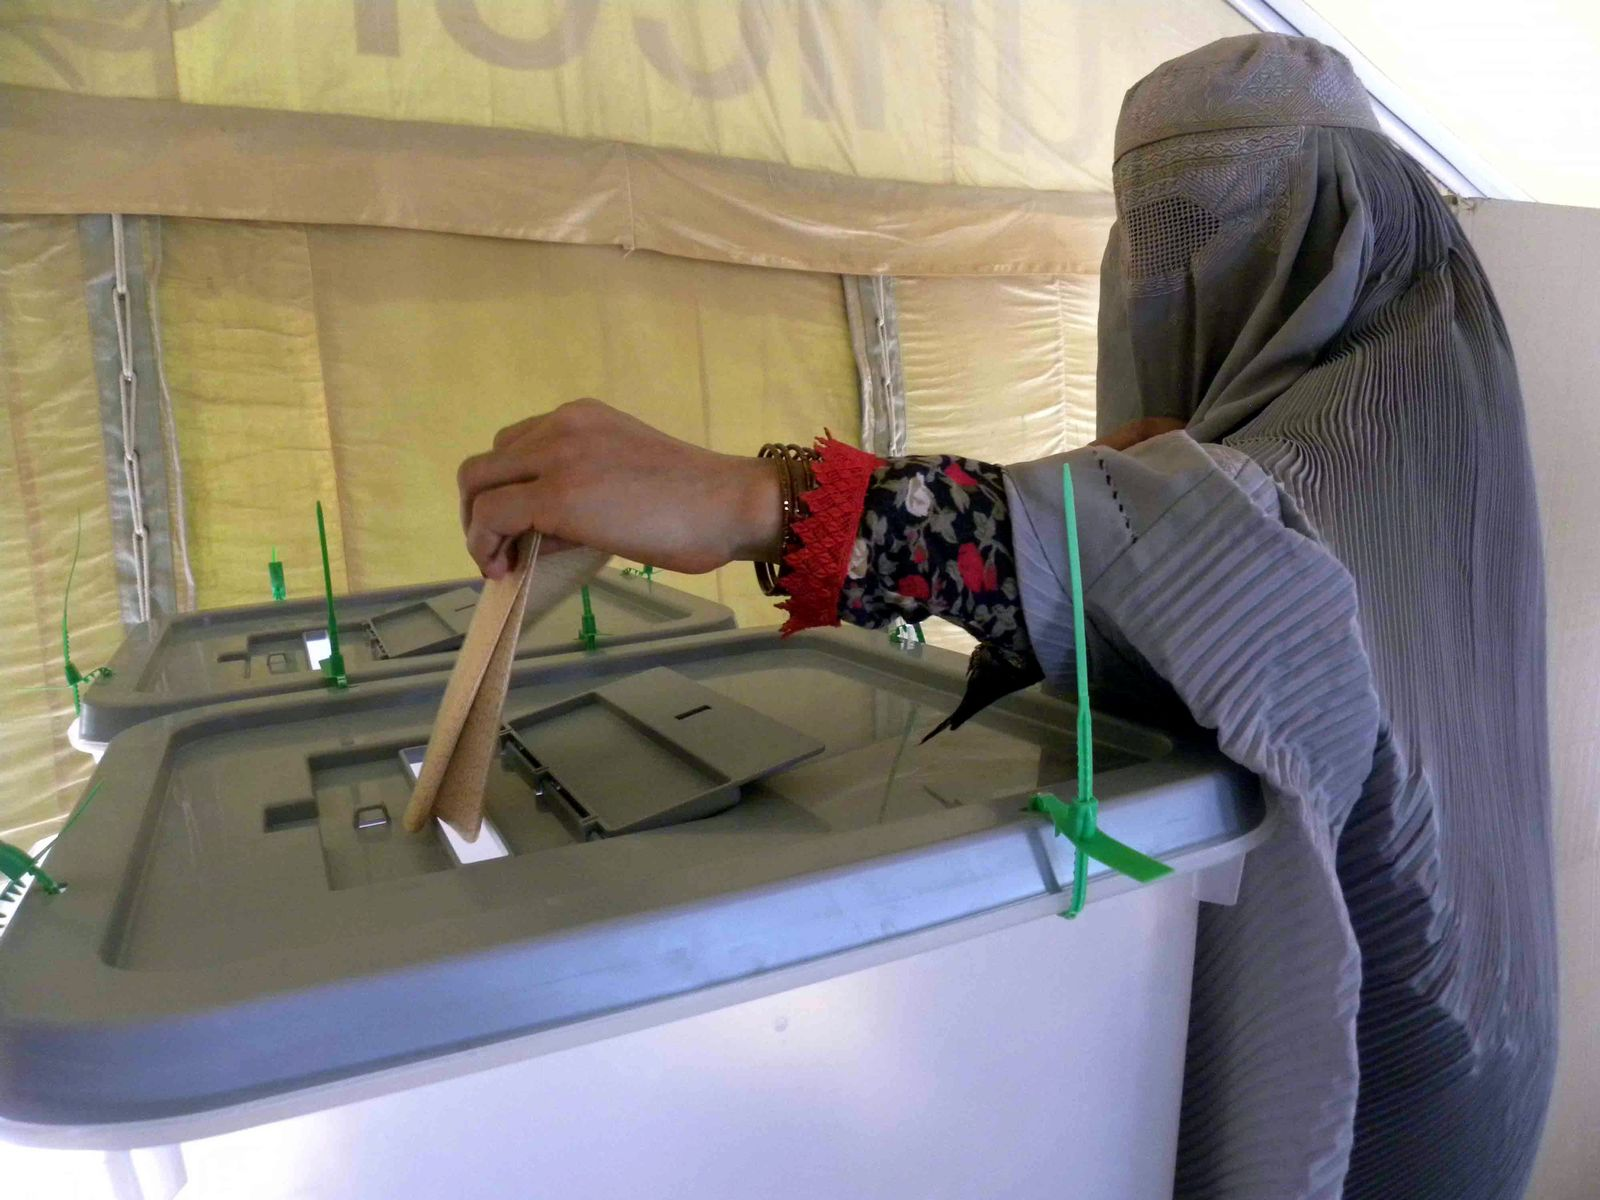 Präsidentschaftswahl in Afghanistan - Wahllokal